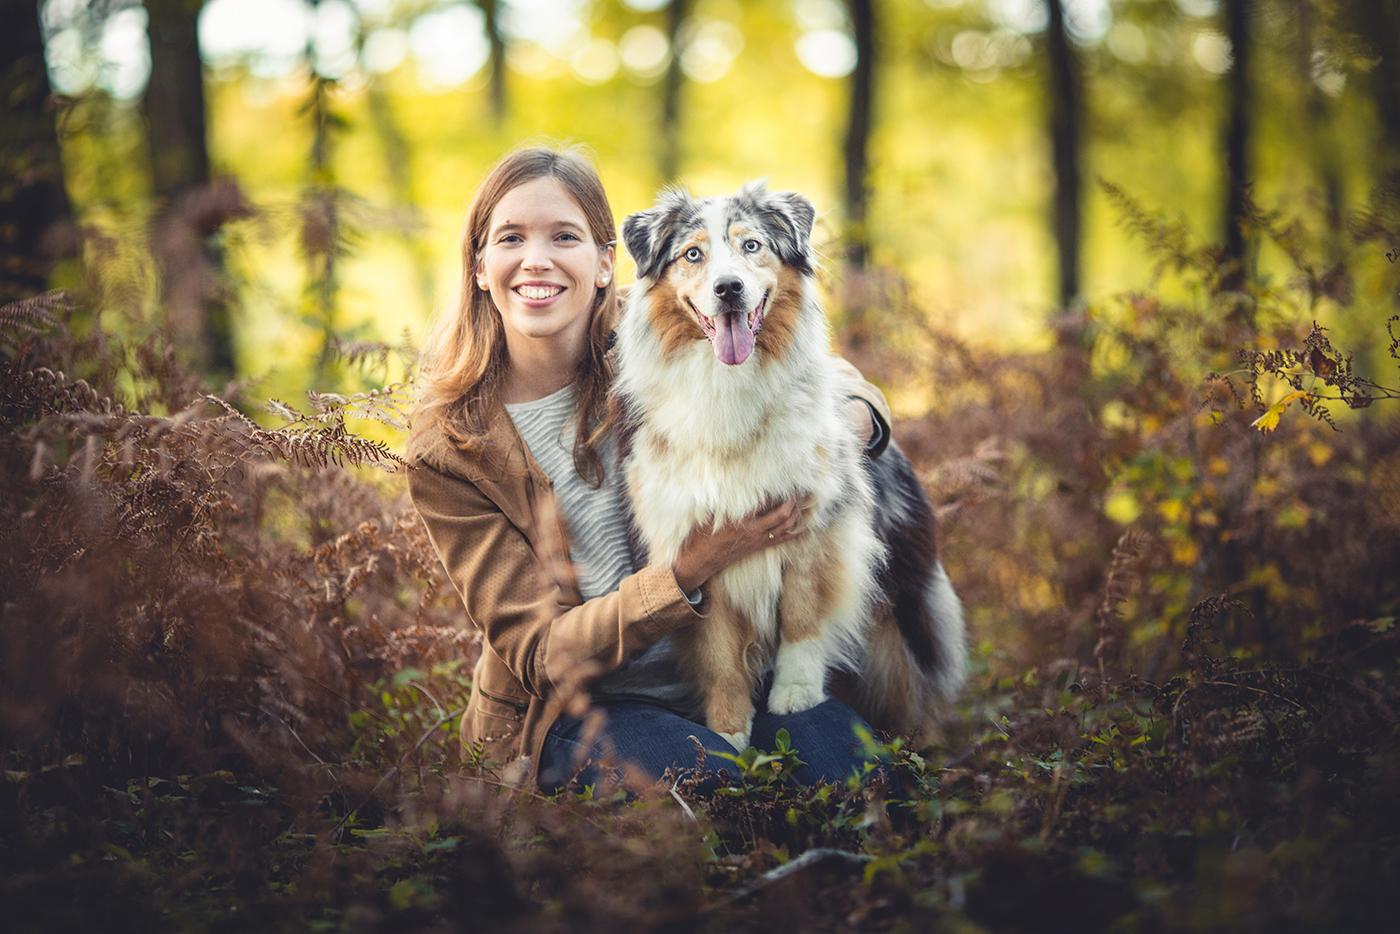 photographe-animalier-chien-canin-poitiers-guillaume-heraud-03